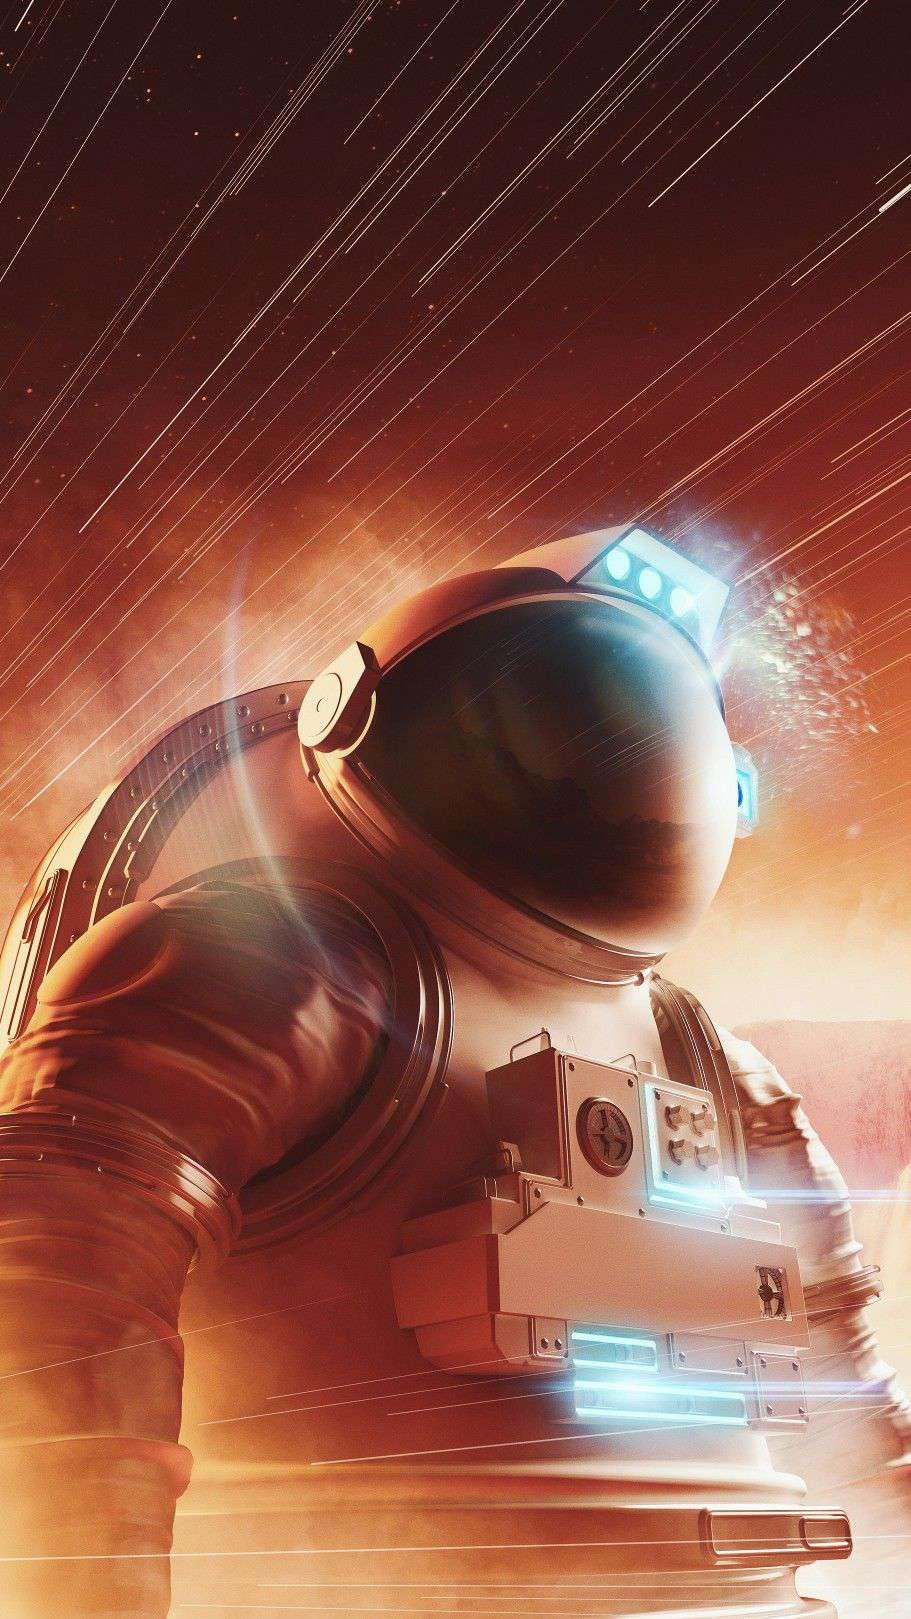 Astronaut Mars HD iPhone Wallpaper